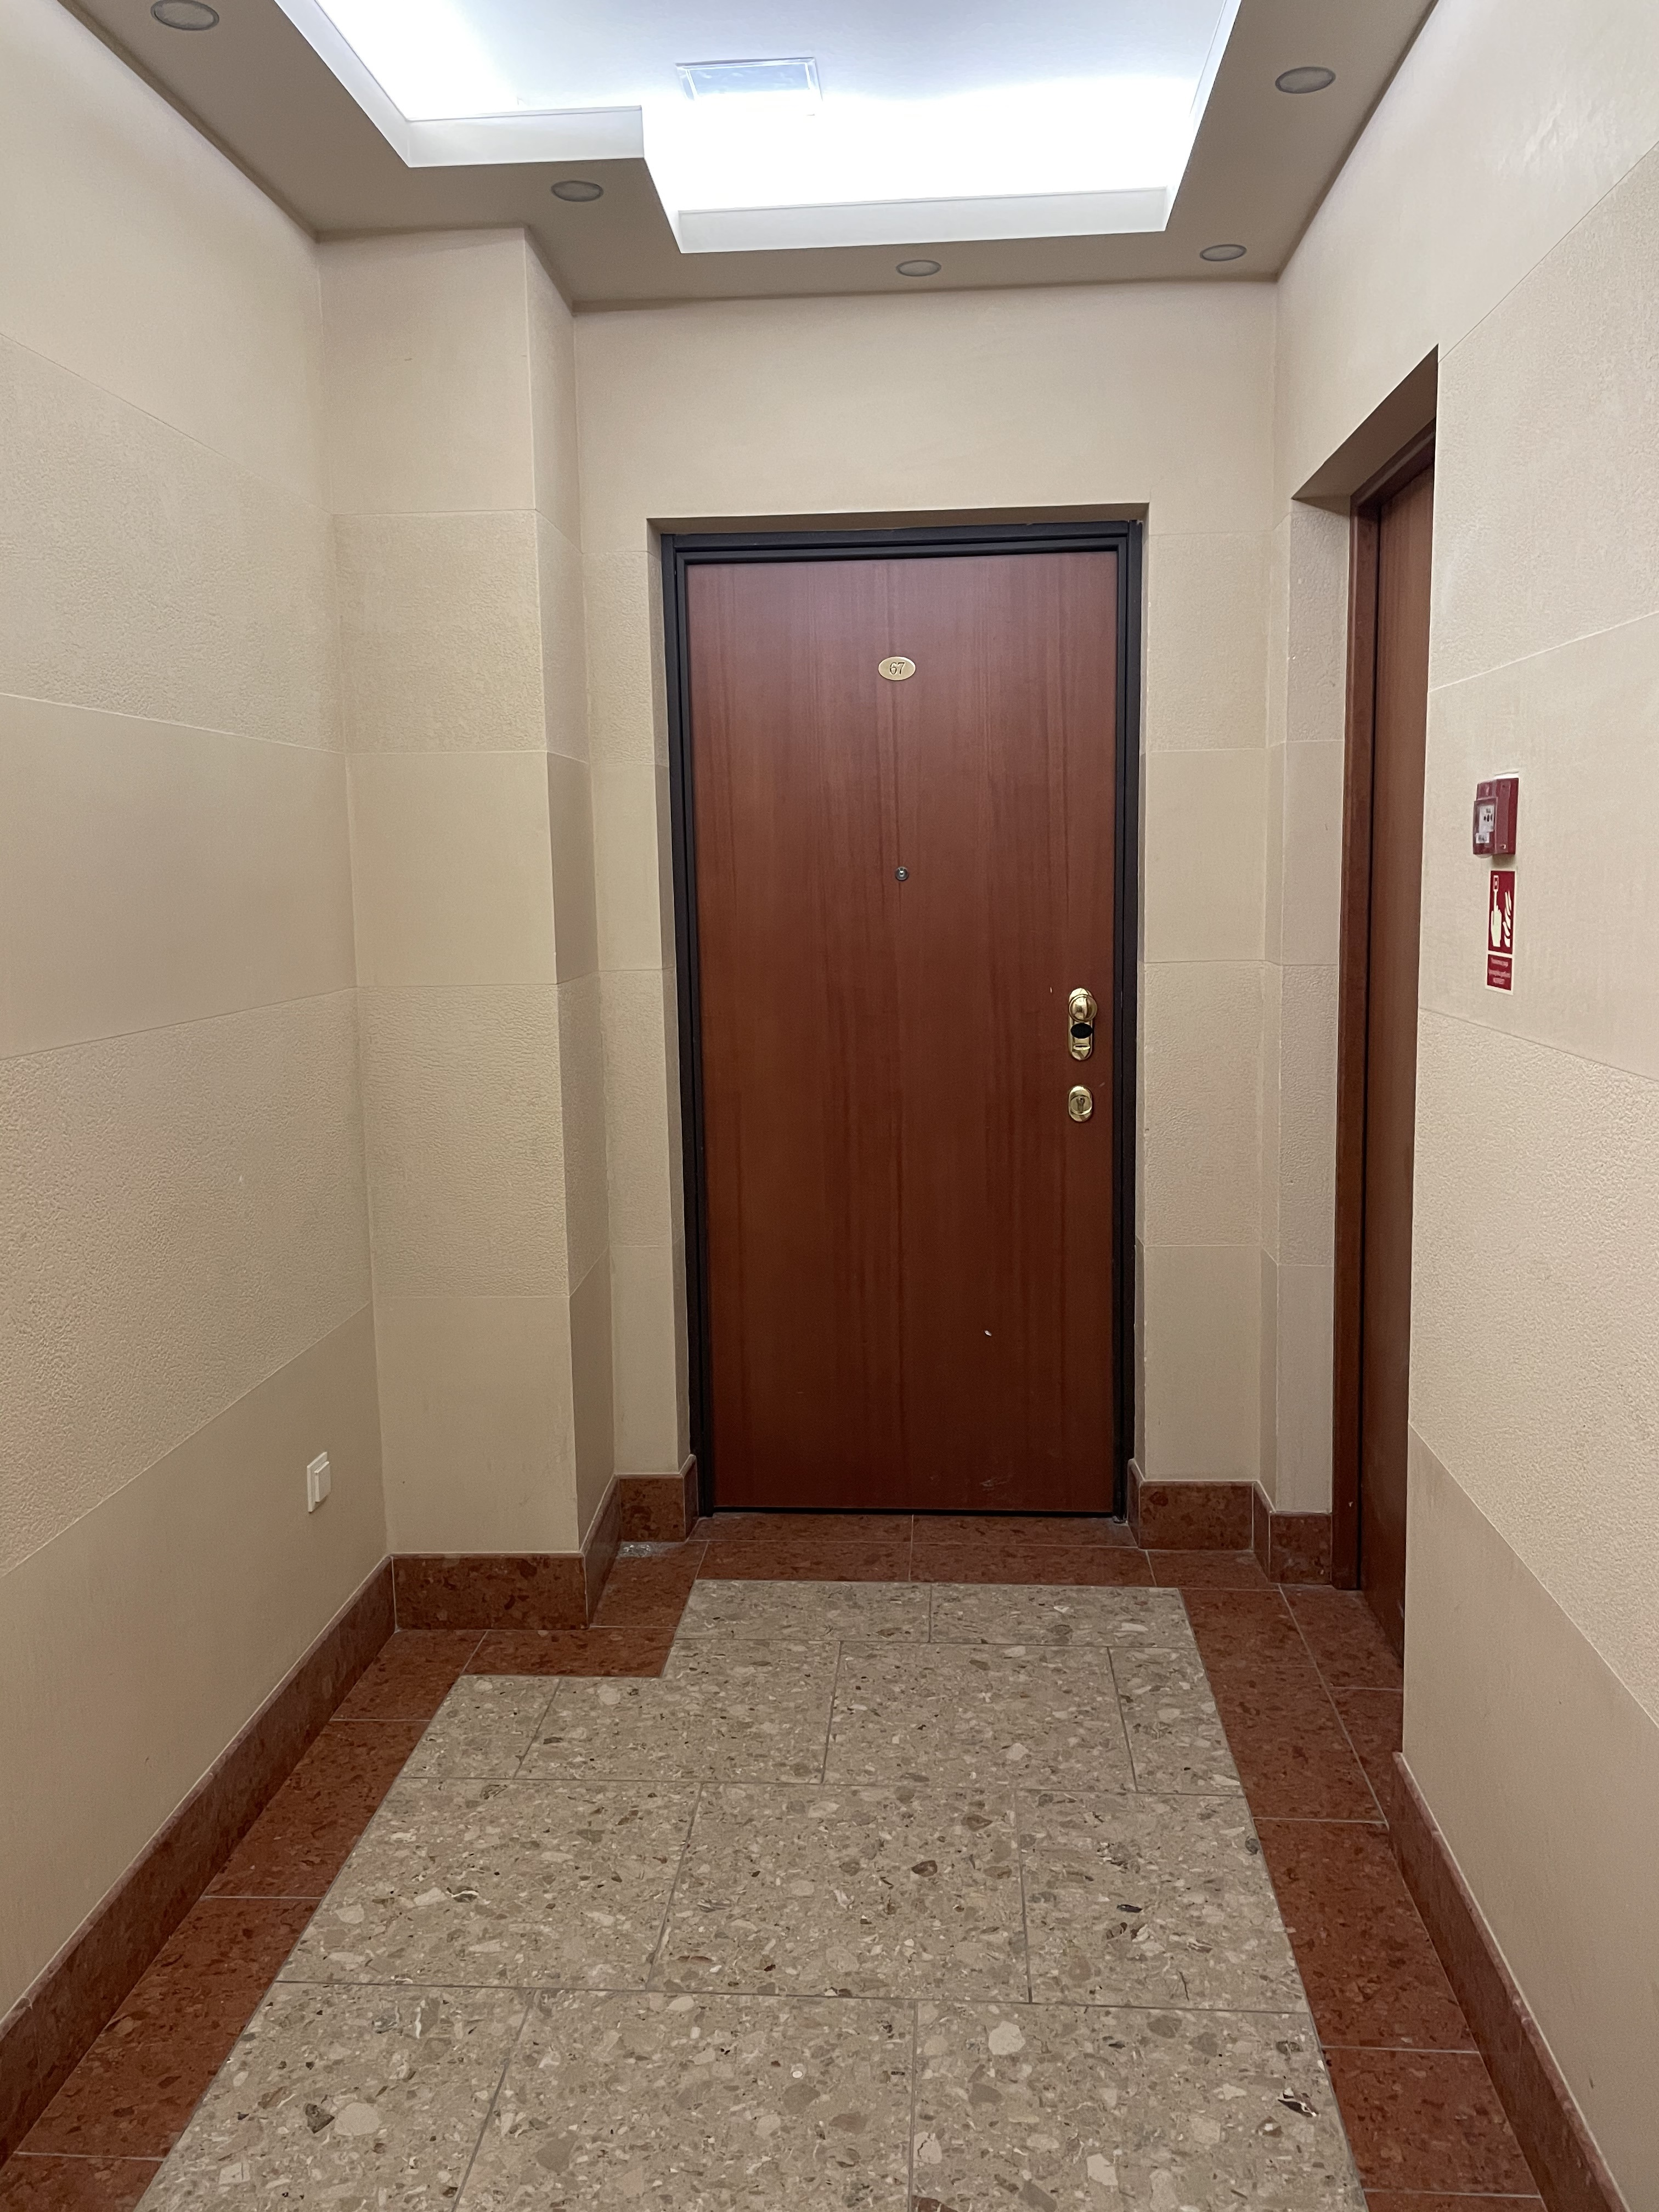 Сдают квартиру, улица Kungu 25 - Изображение 1